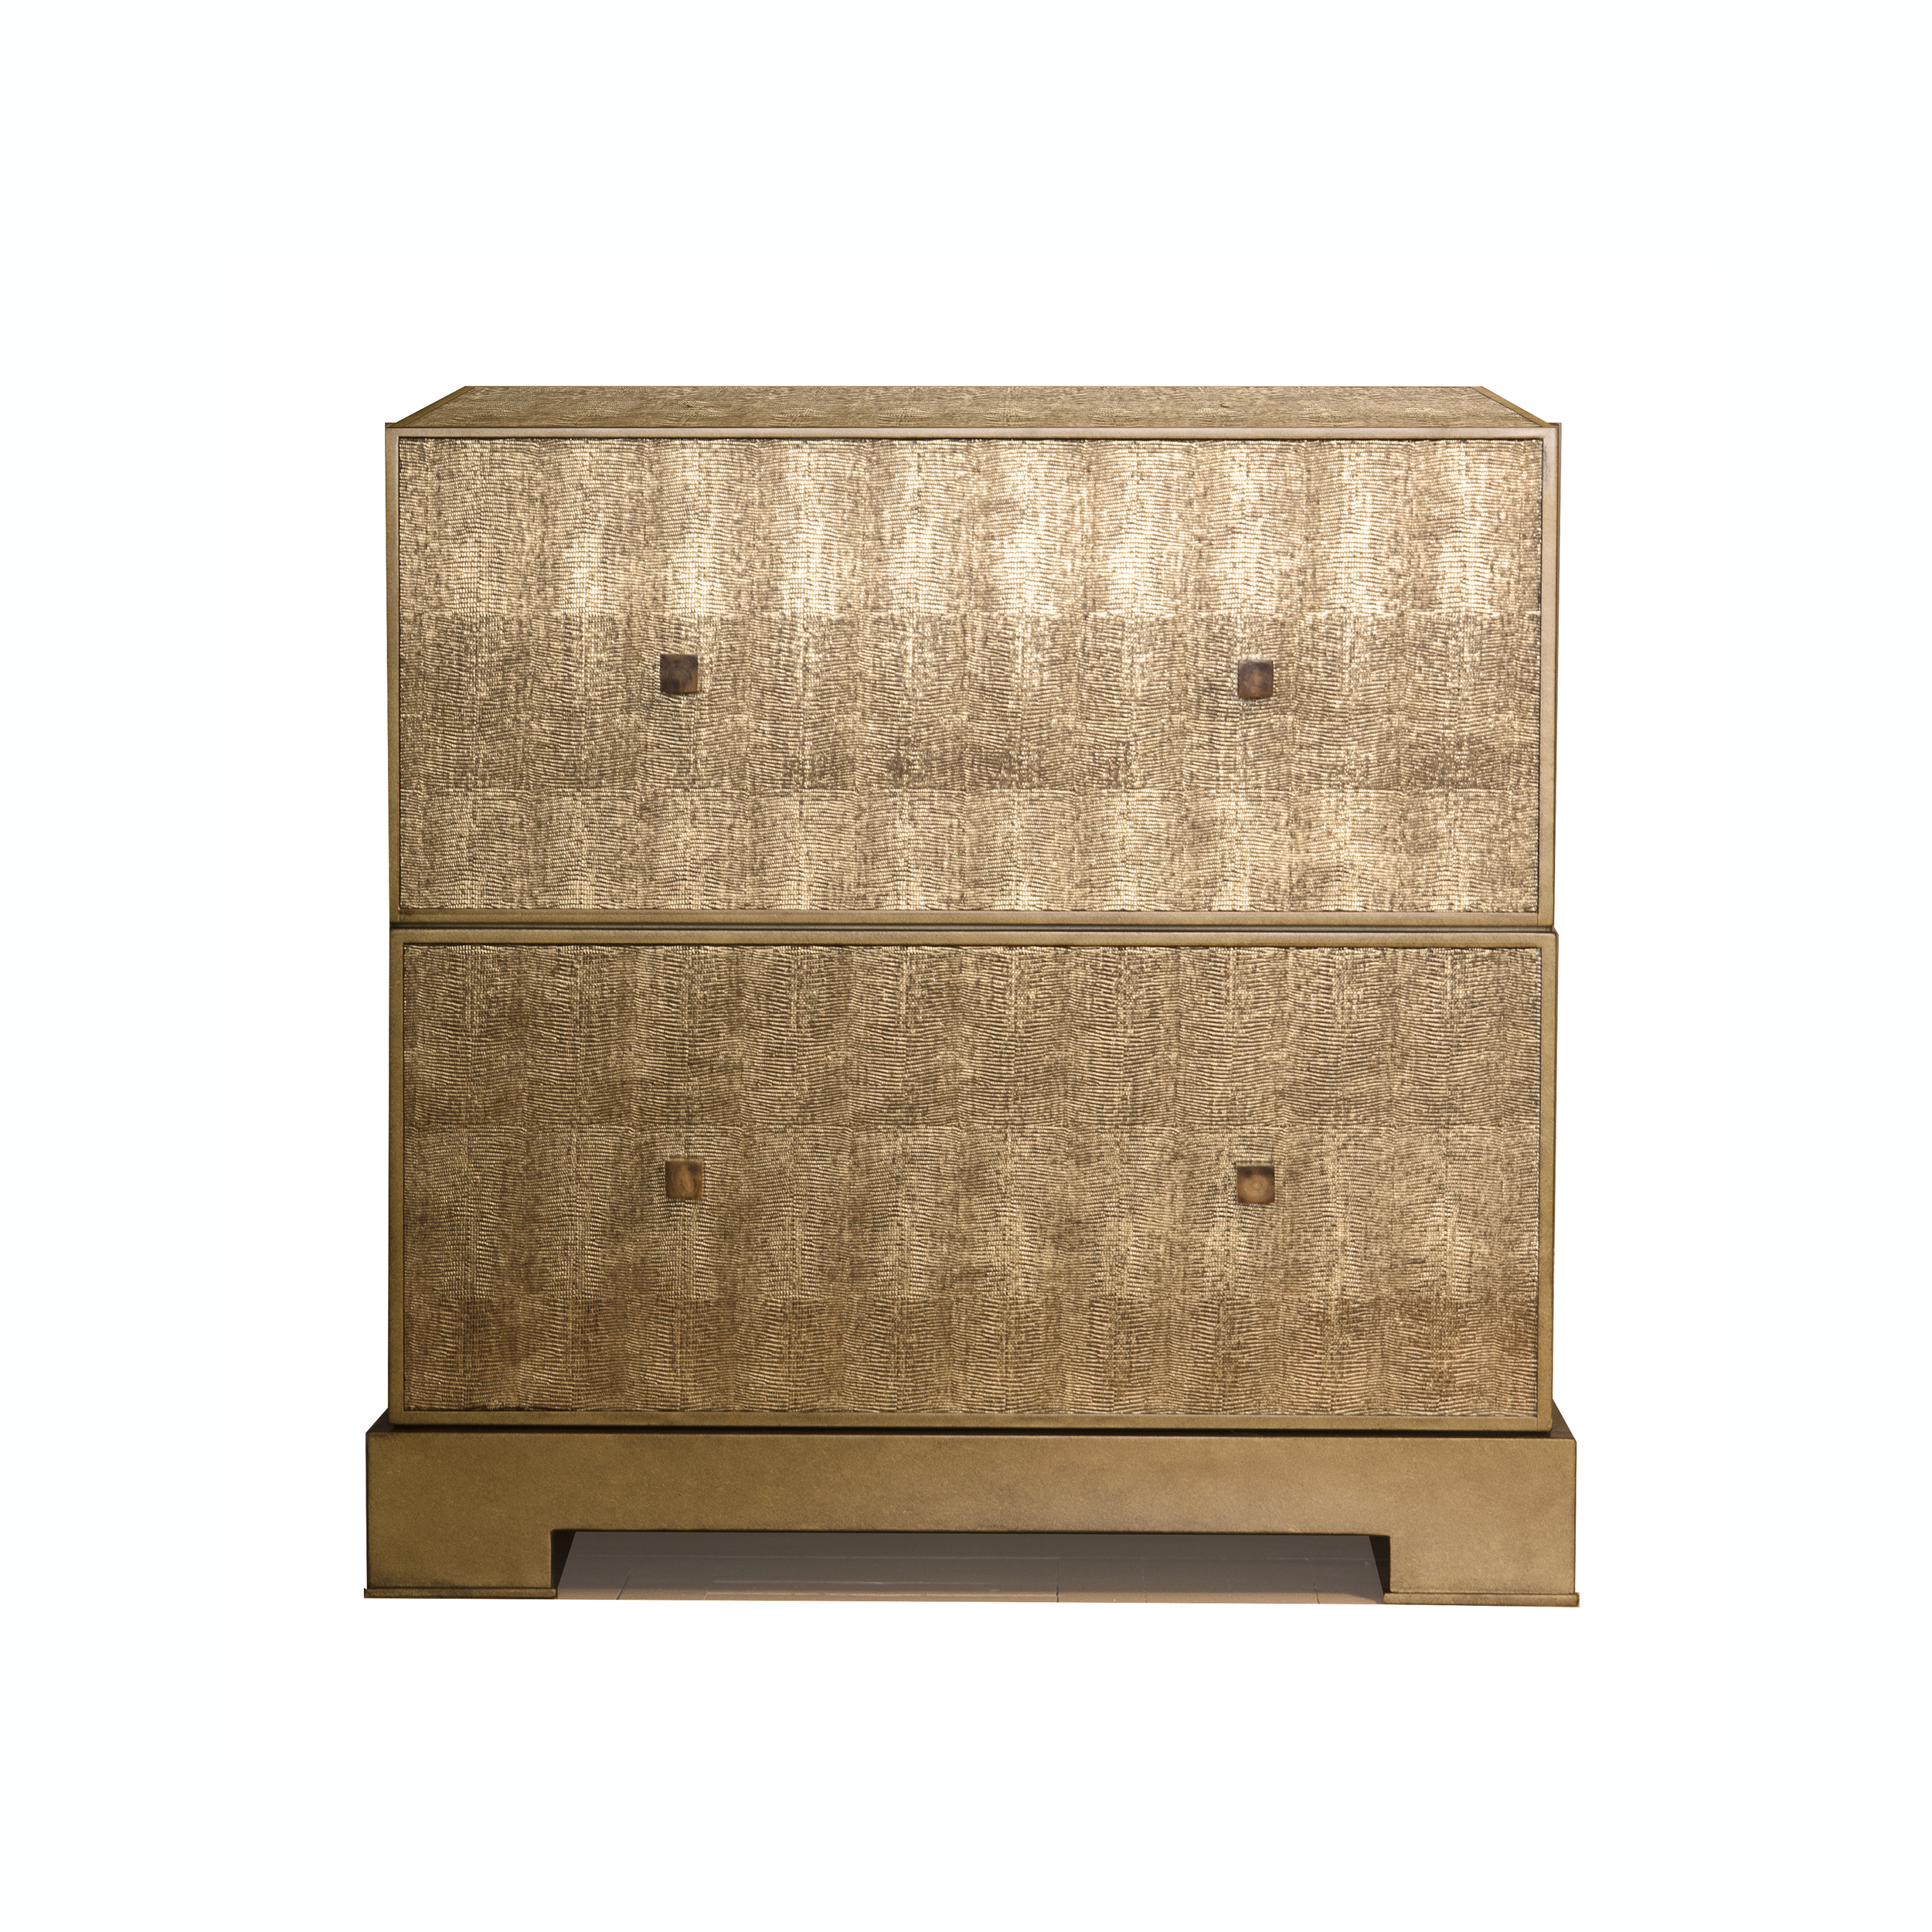 Bureau, End Table in Loja Gold.3.lr.jpg